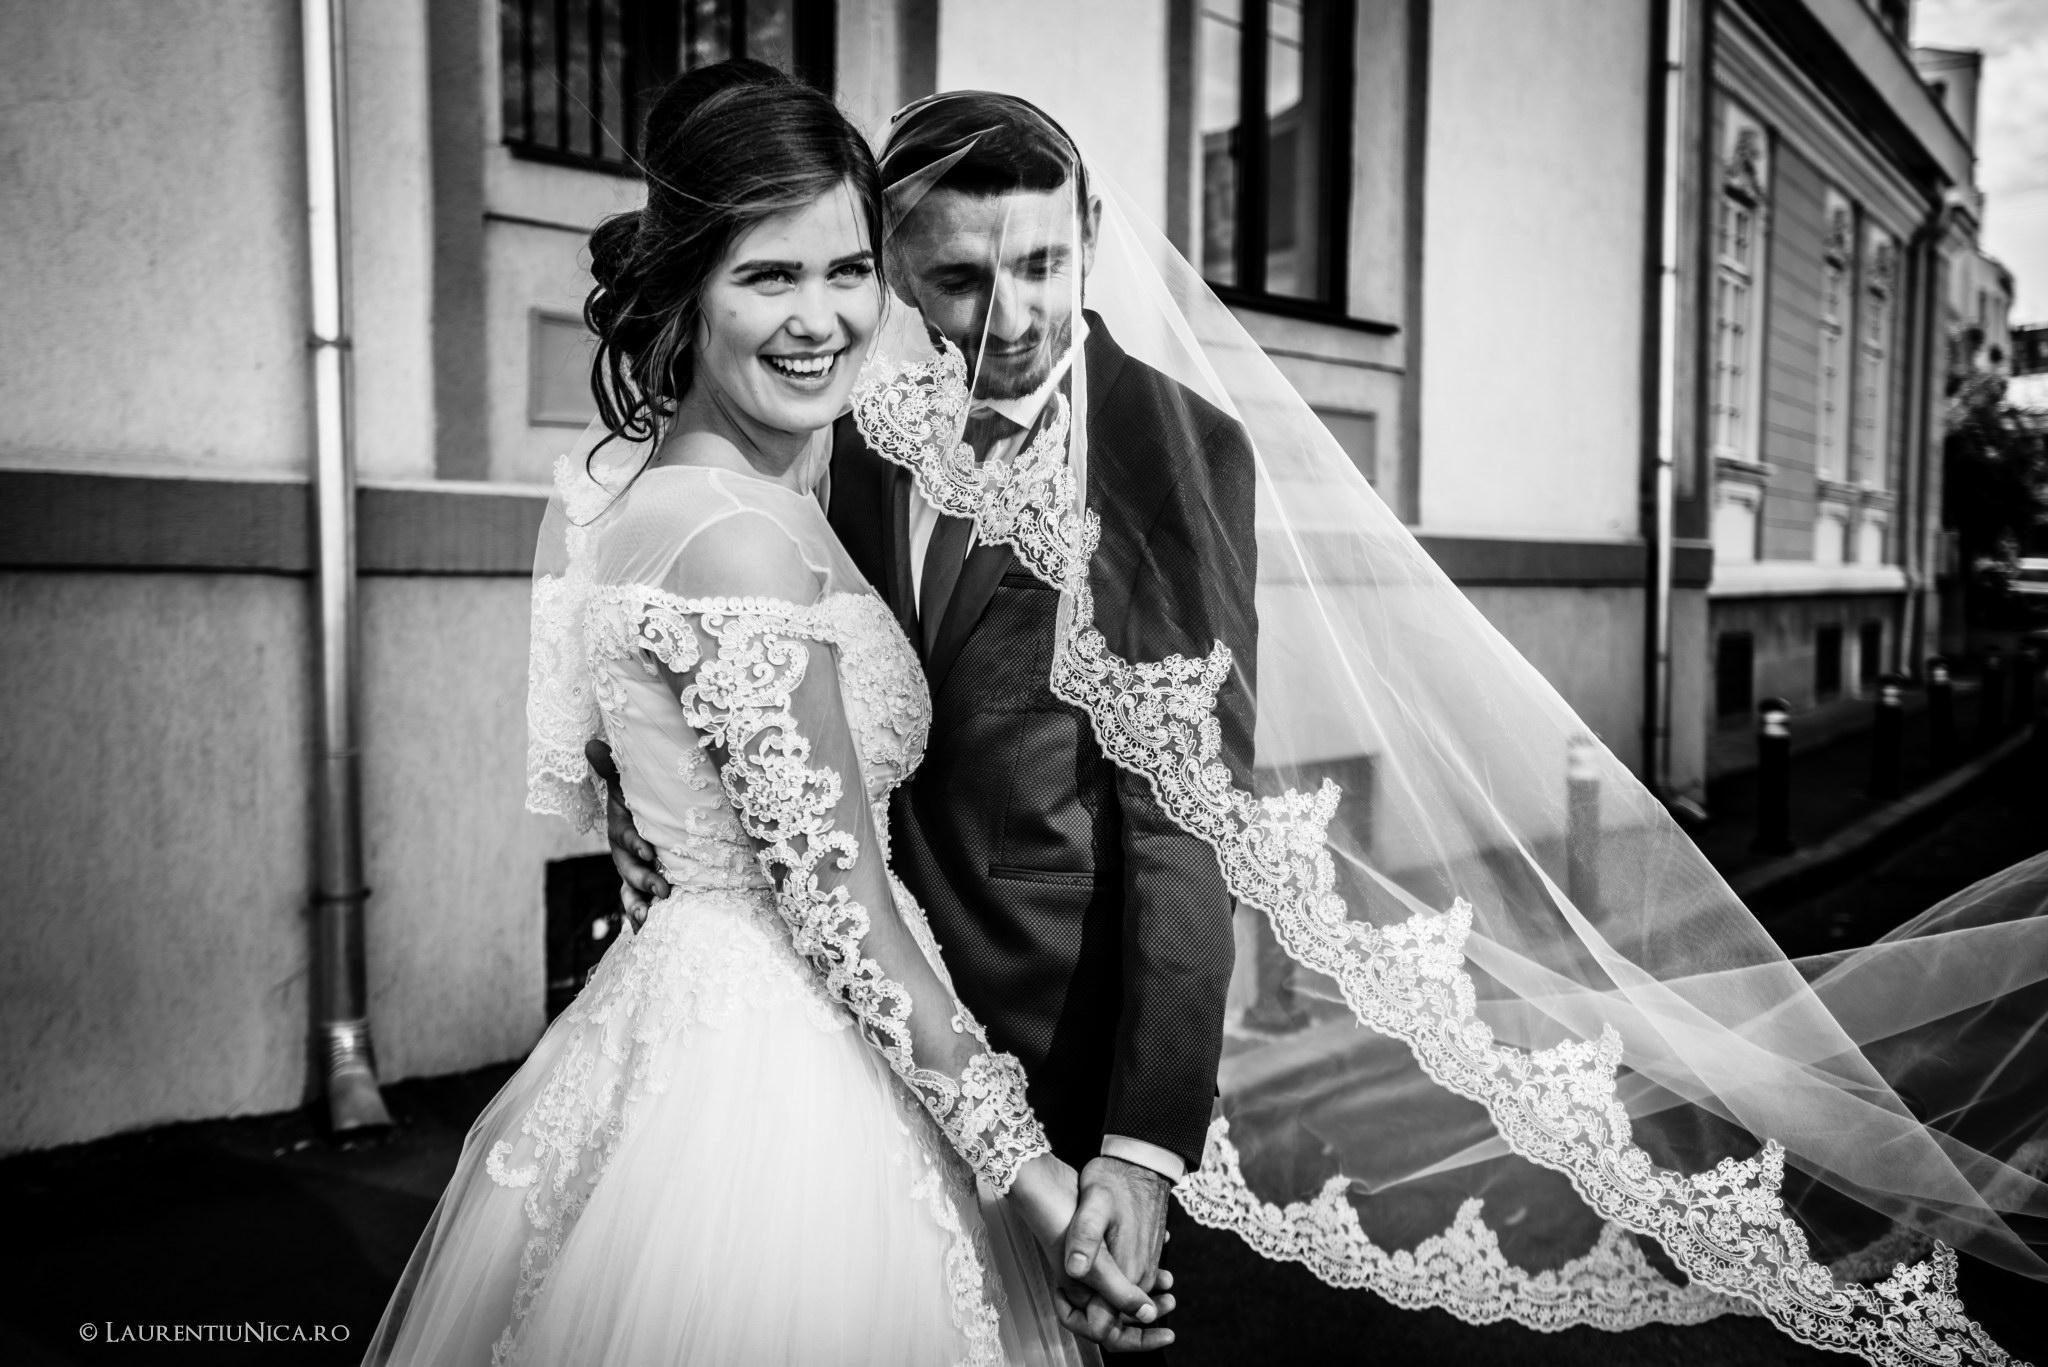 Alina si Andrei fotograf nunta laurentiu nica craiova 31 - Alina & Andrei | Fotografii nunta